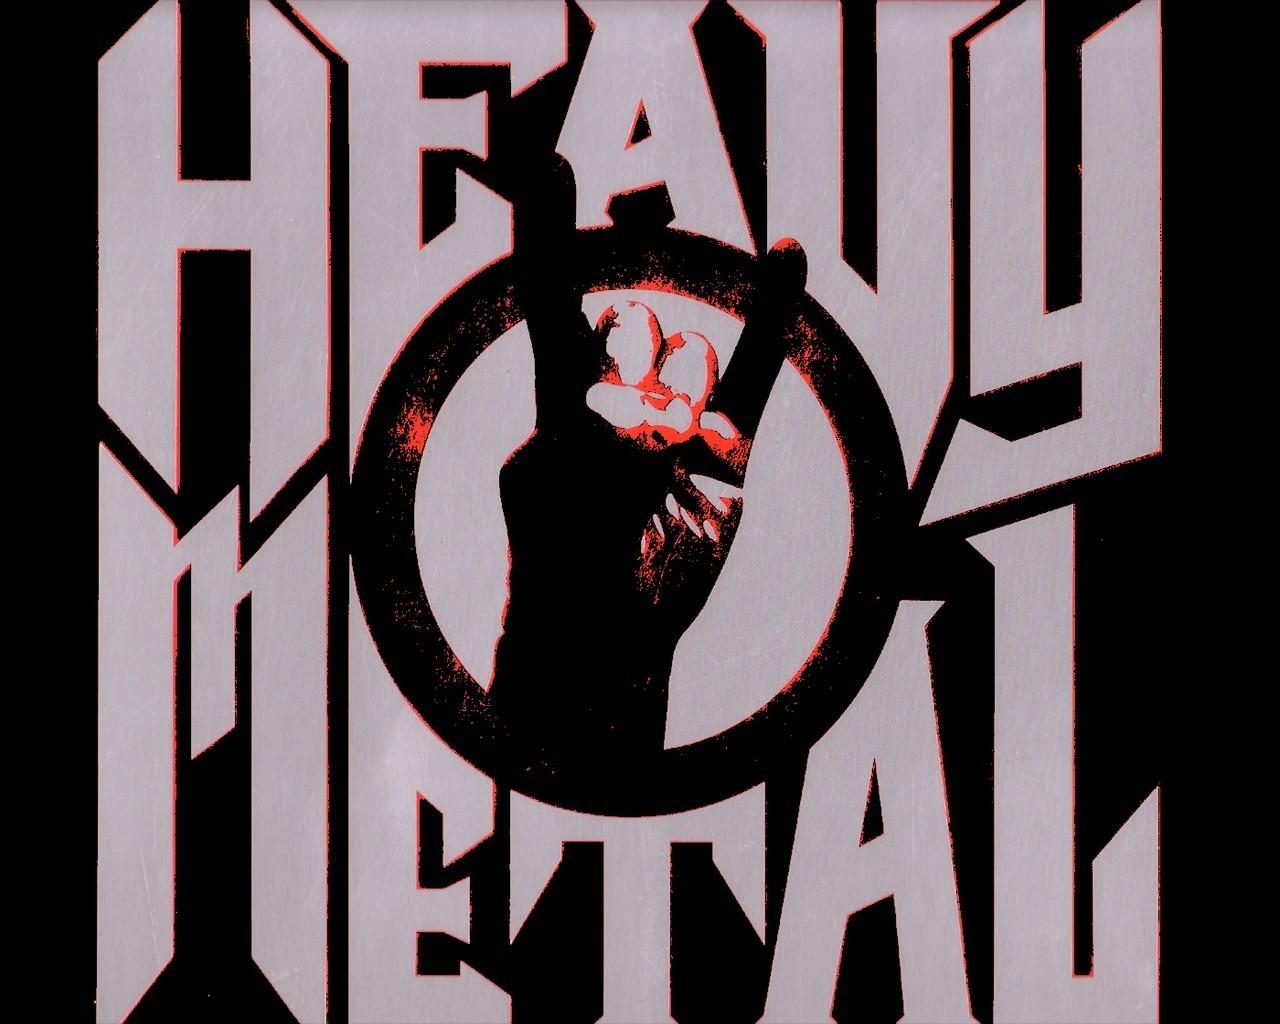 Heavy Metal Wallpaper 21000475 1280 1024